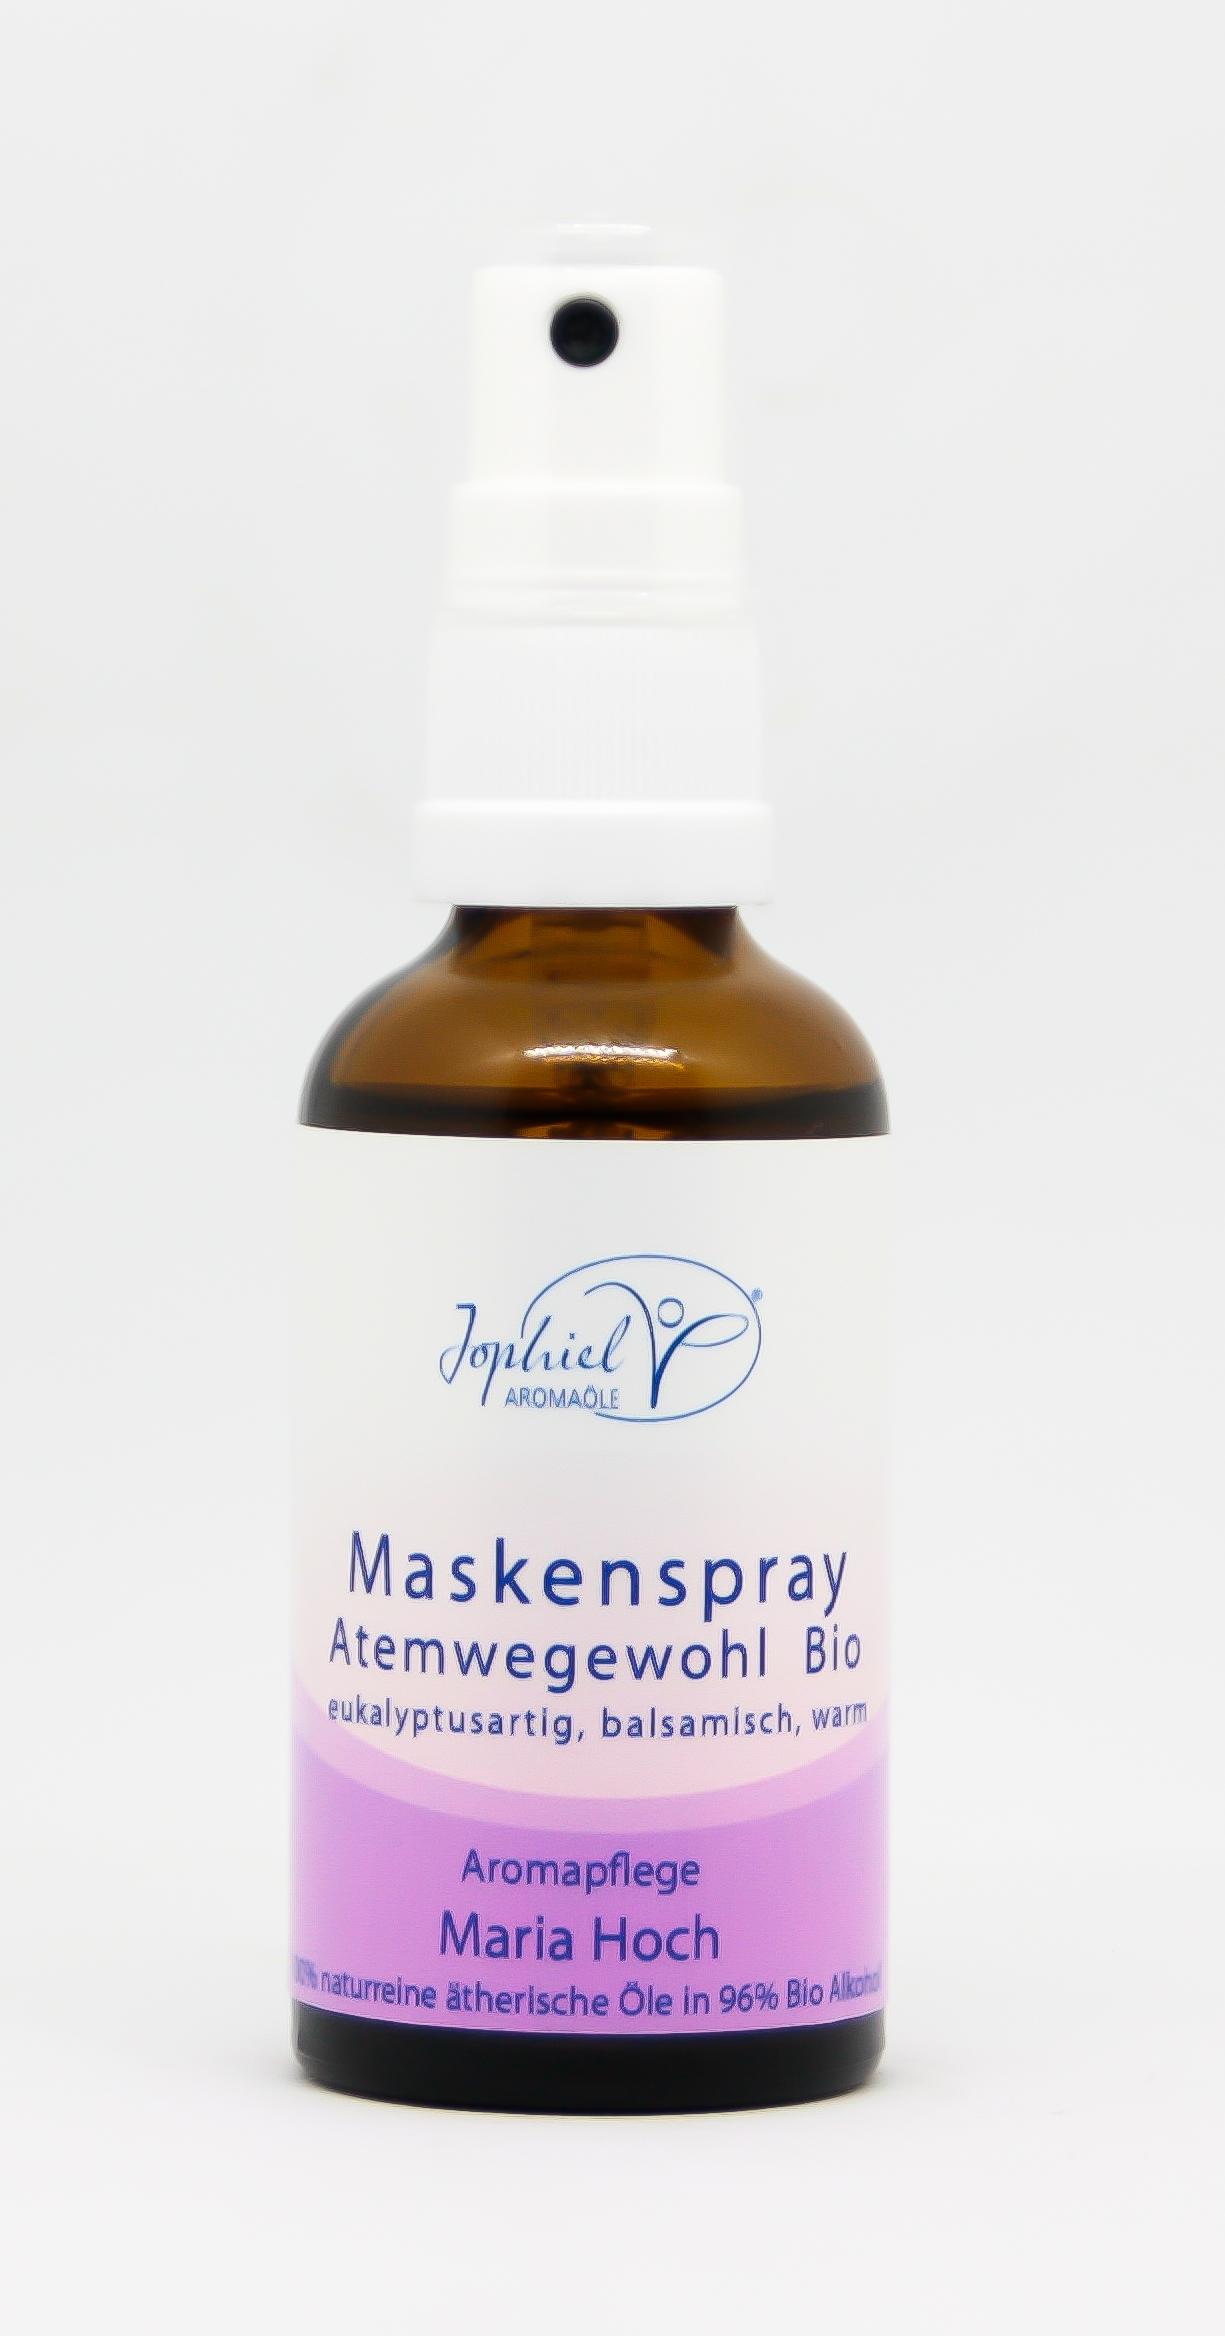 Maskenspray Atemwegewohl Bio 50 ml